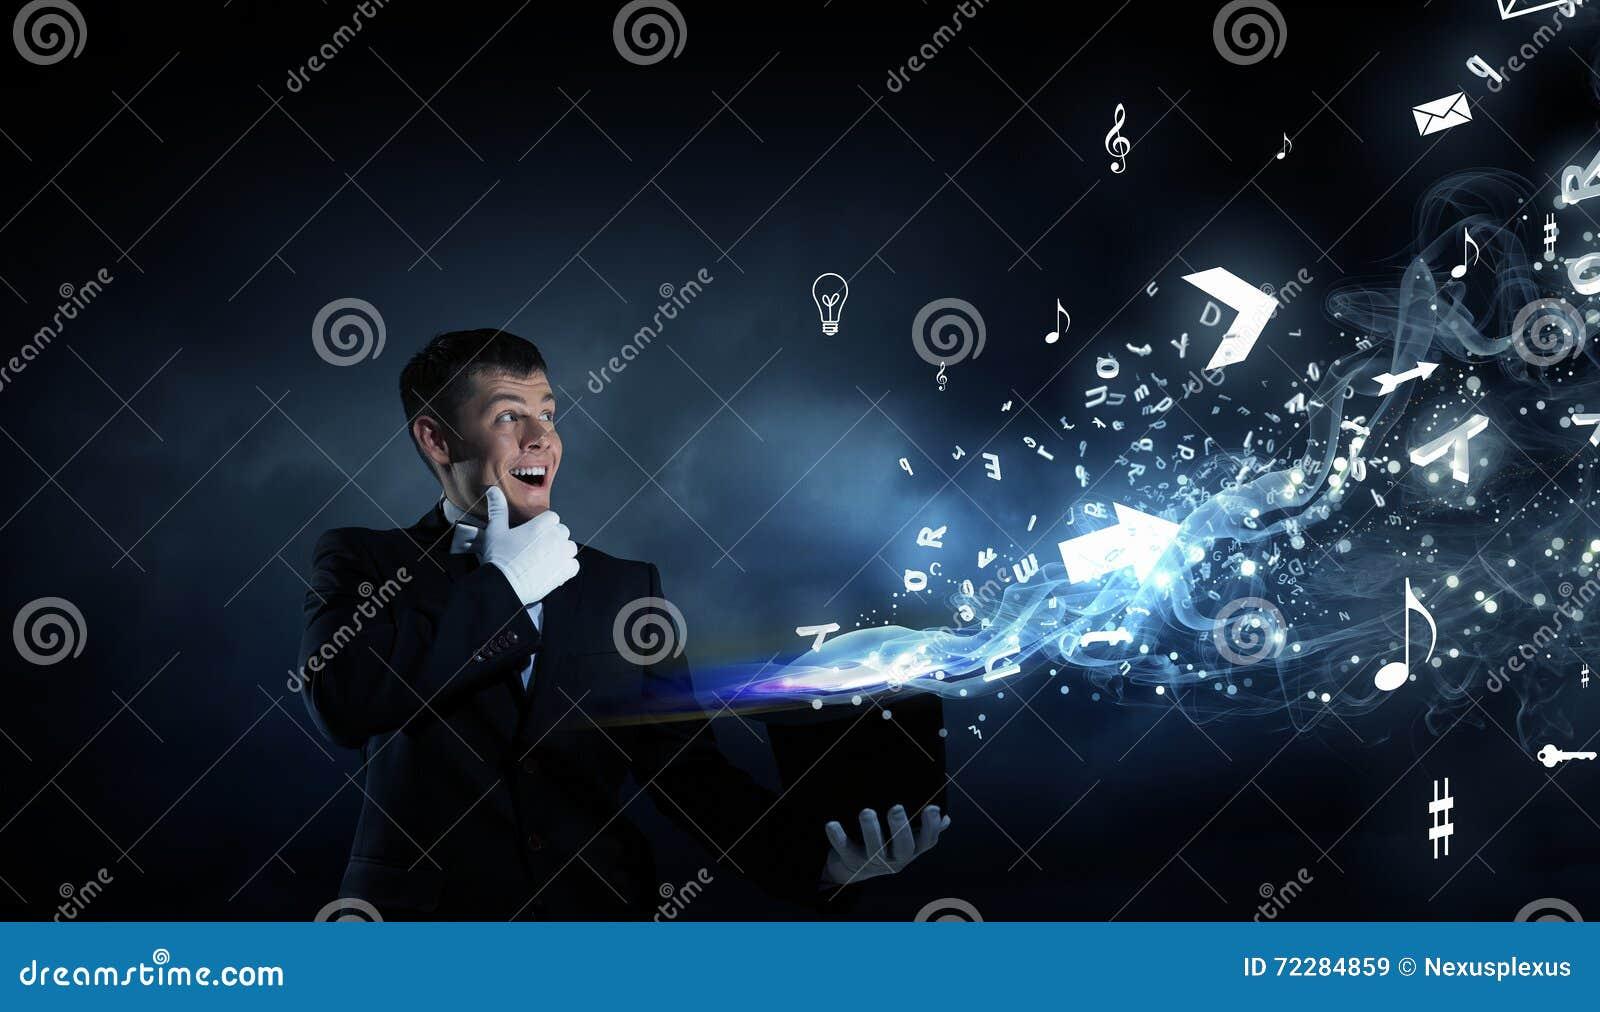 Download Волшебник человека с шляпой цилиндра Стоковое Изображение - изображение насчитывающей сила, аппаратура: 72284859